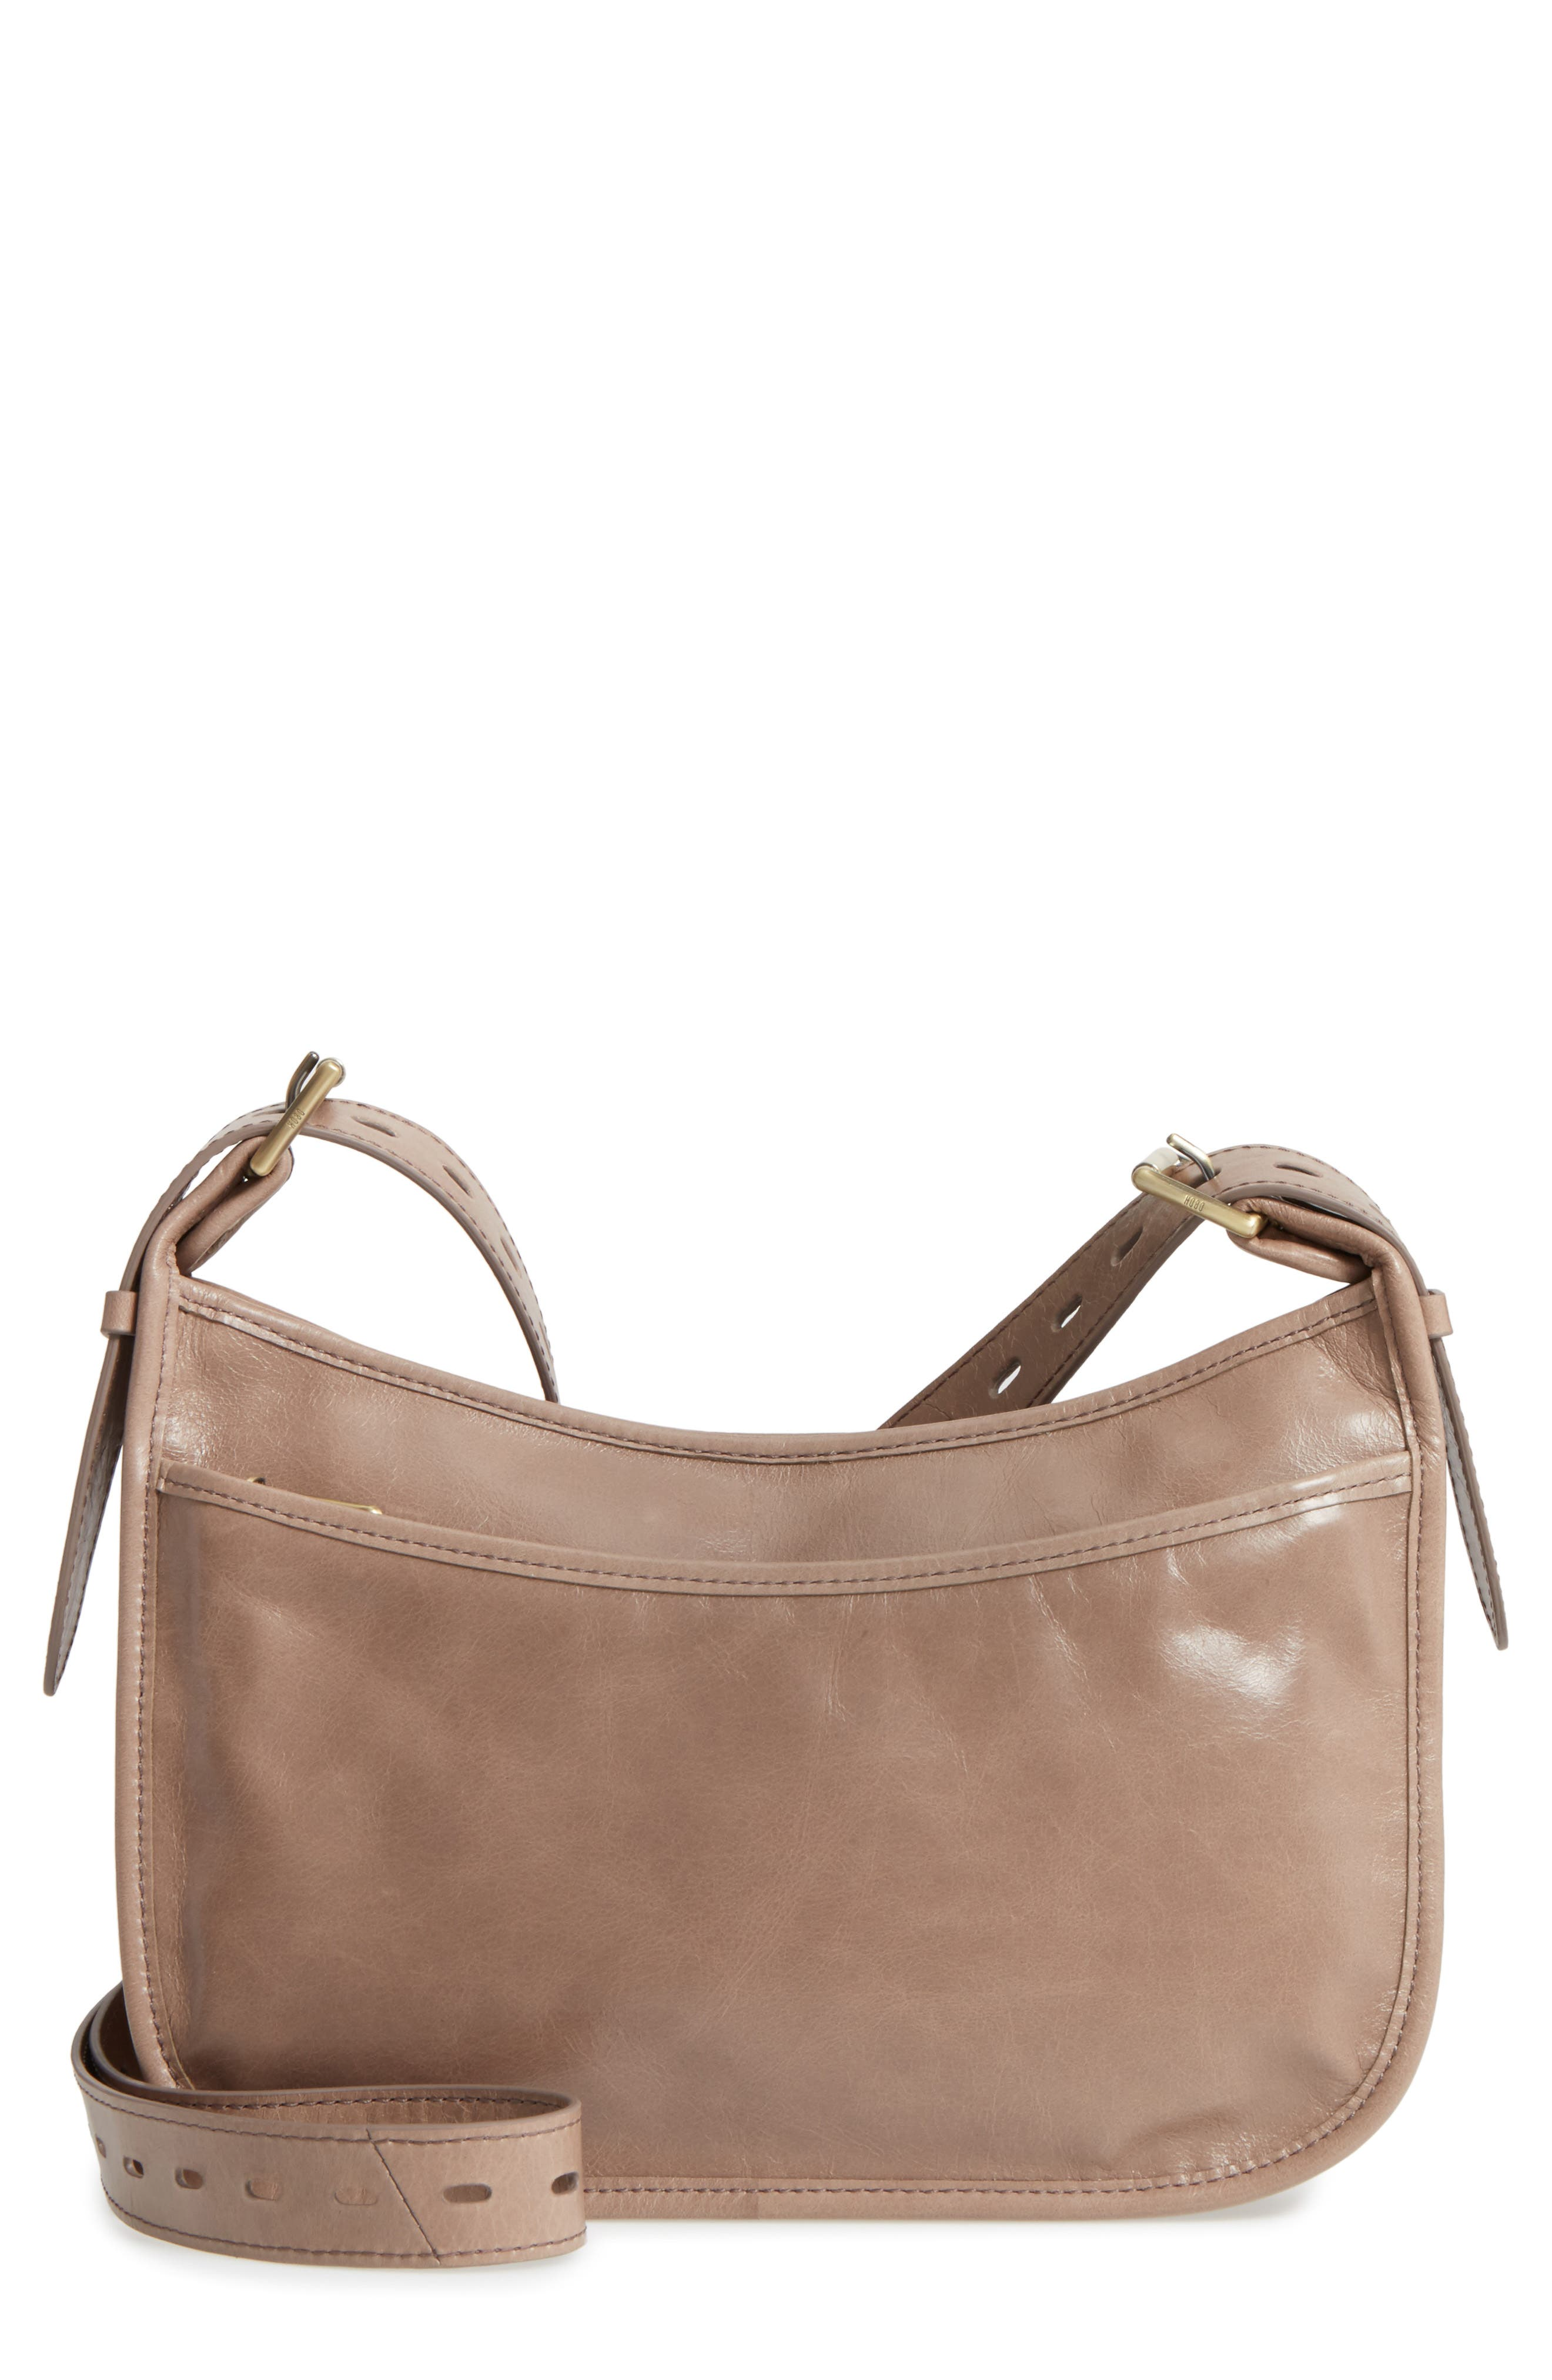 Alternate Image 1 Selected - Hobo Chase Calfskin Leather Crossbody Bag